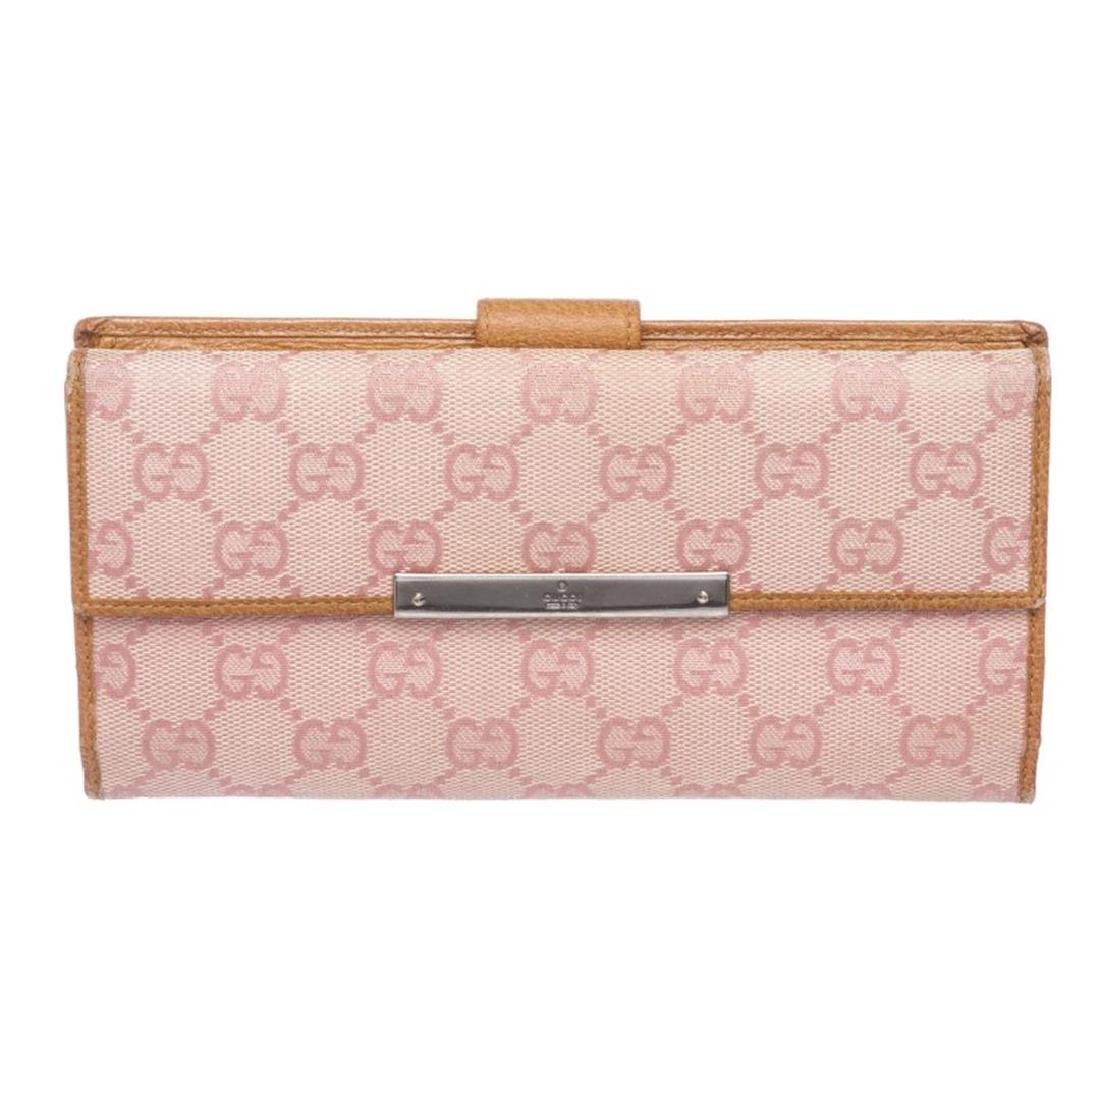 Gucci Pink Beige Canvas Leather Monogram Long Wallet